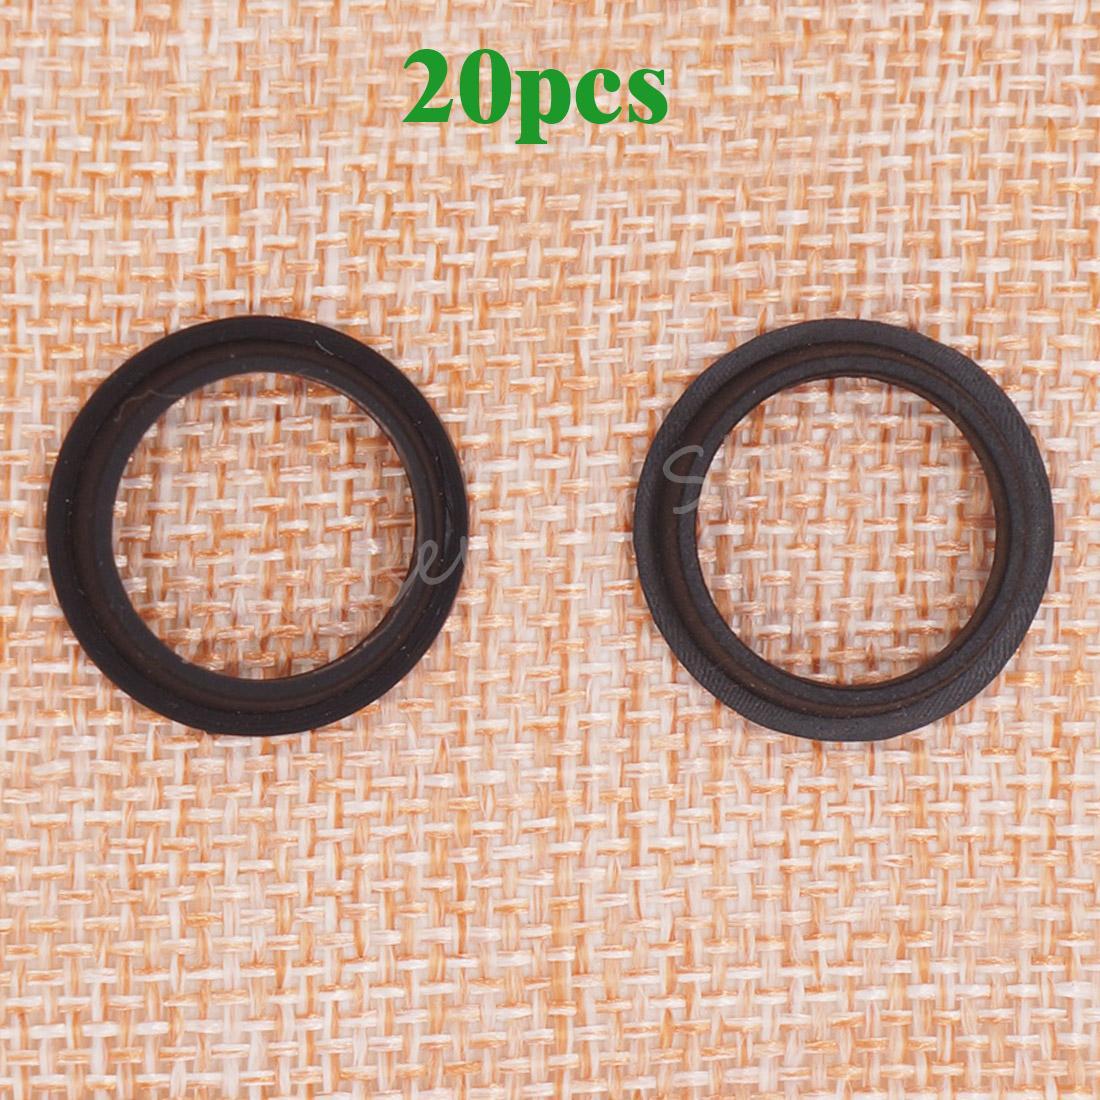 20pcs Universal Car Pdc Parking Sensor O Ring 6923000 For Gm Chrysler Peugeot Buick Parking Bumper Object 0263006052 Etc Black